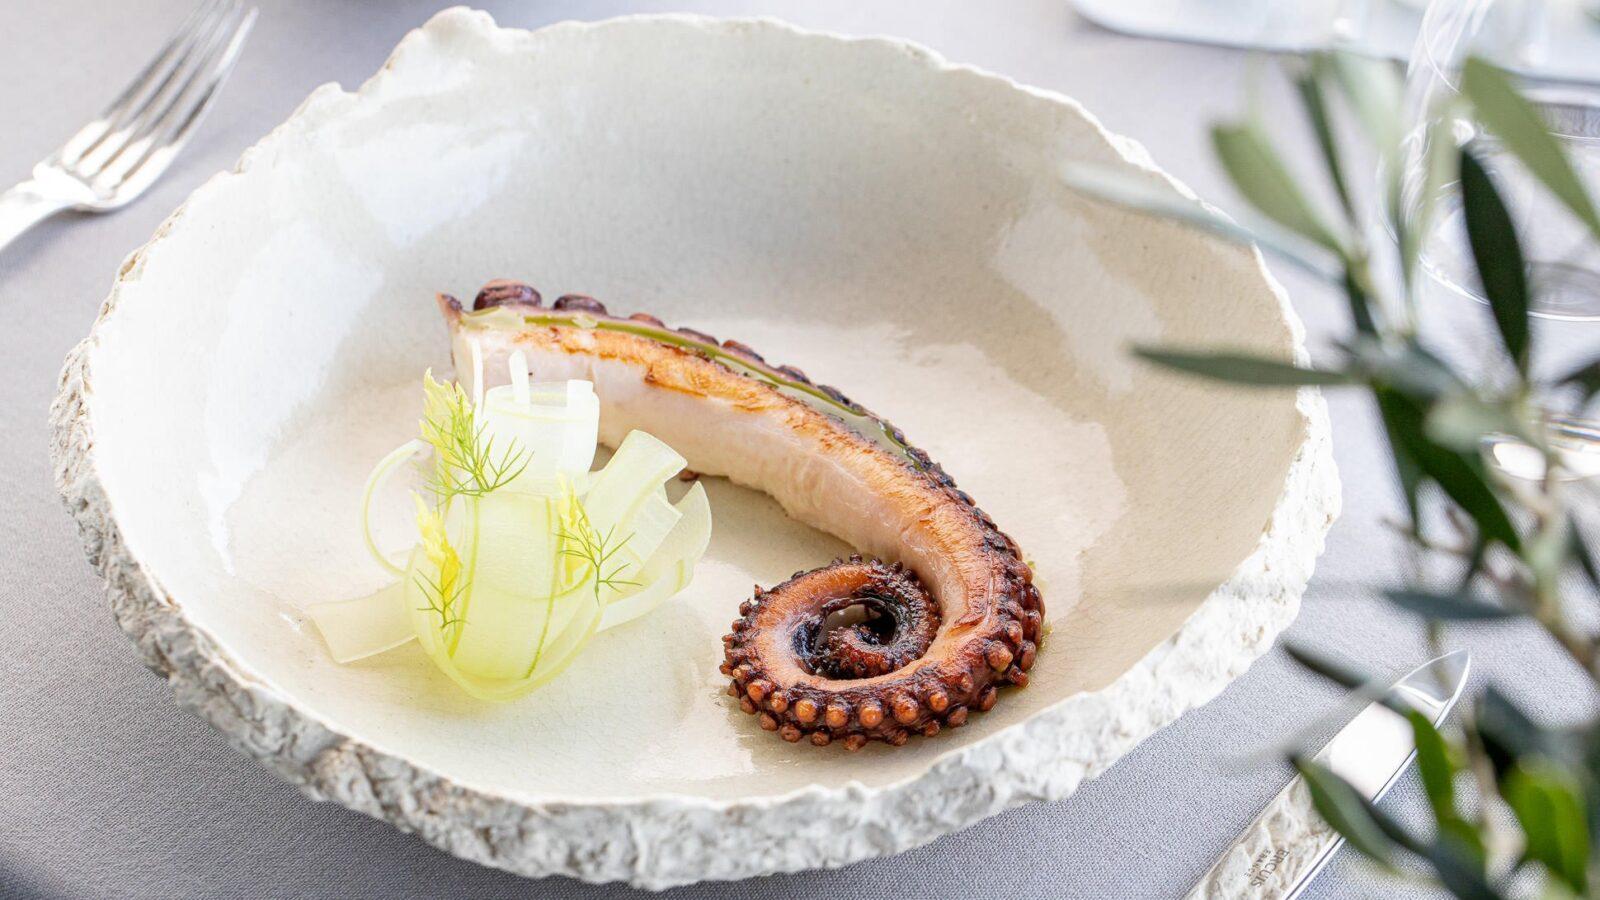 La Terrazza - Octopus and celery